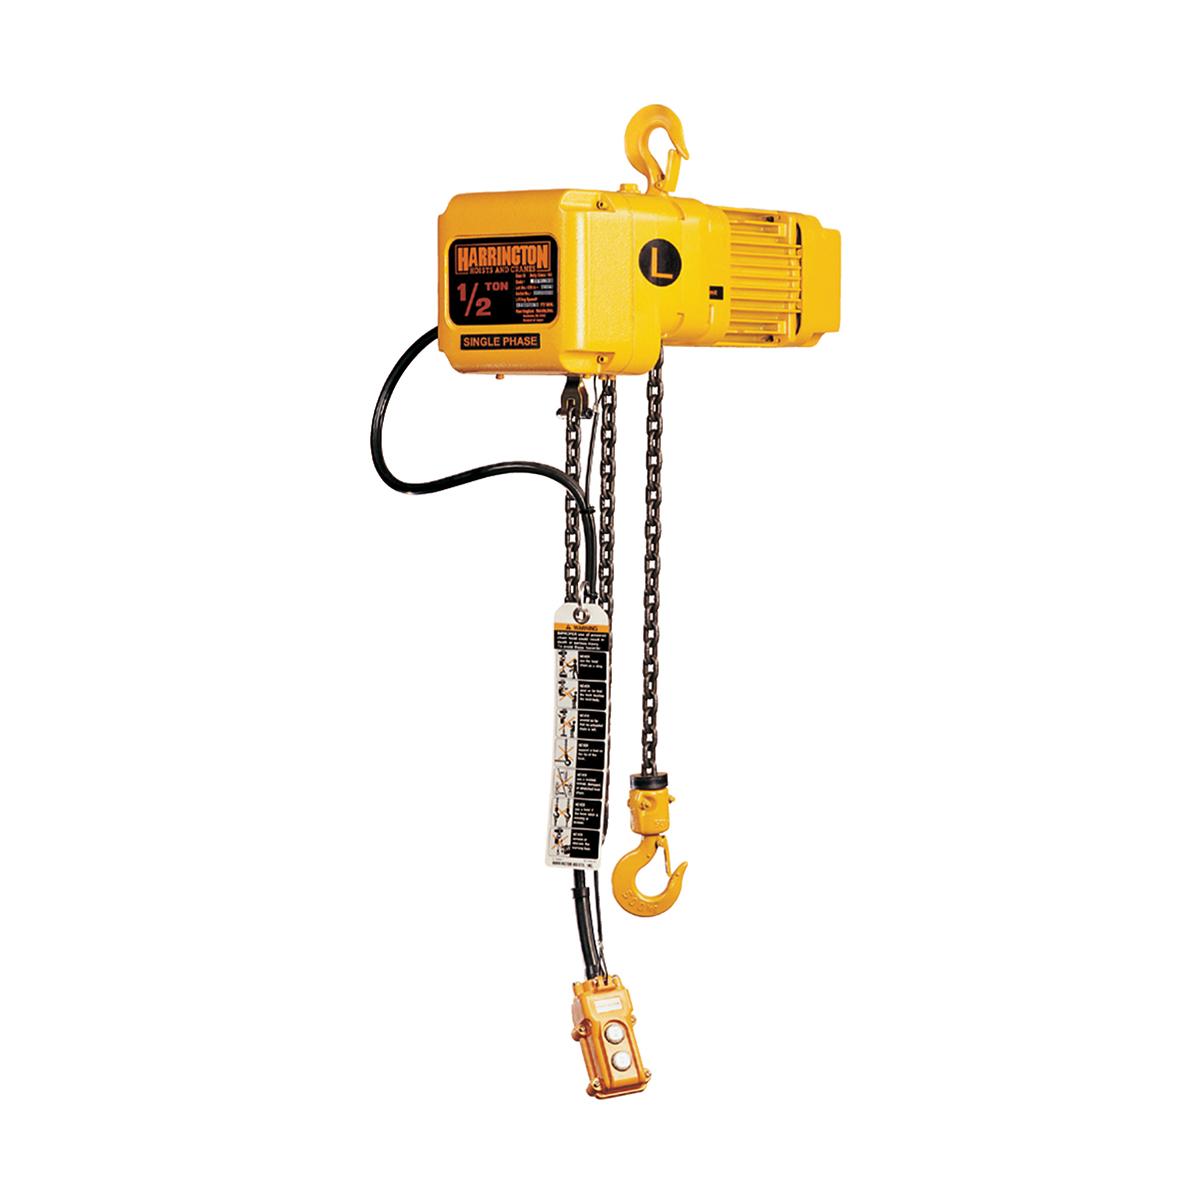 Harrington SNER Single Phase Electric Chain Hoists